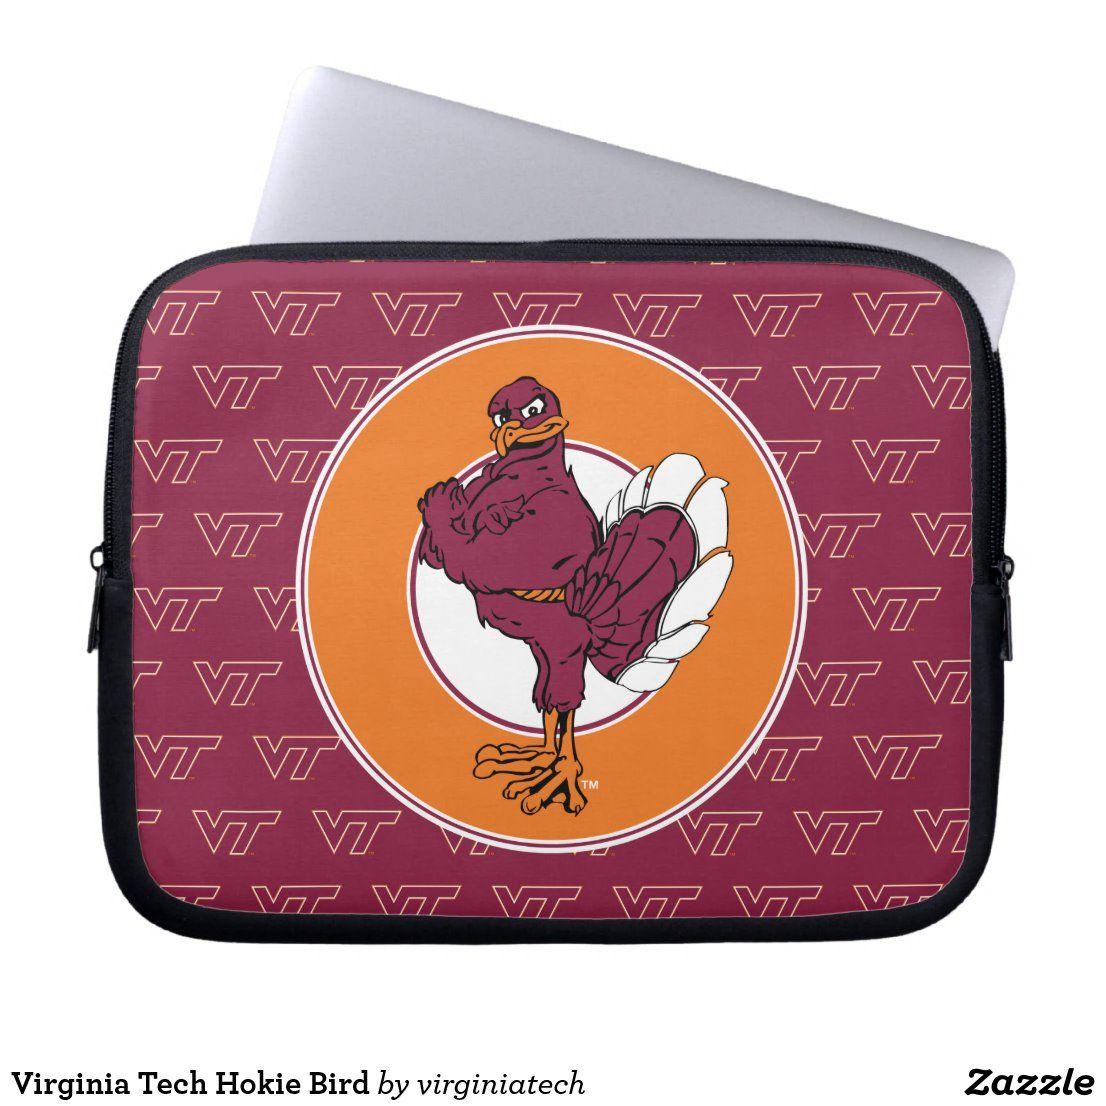 Virginia Tech Hokie Bird Laptop Sleeve